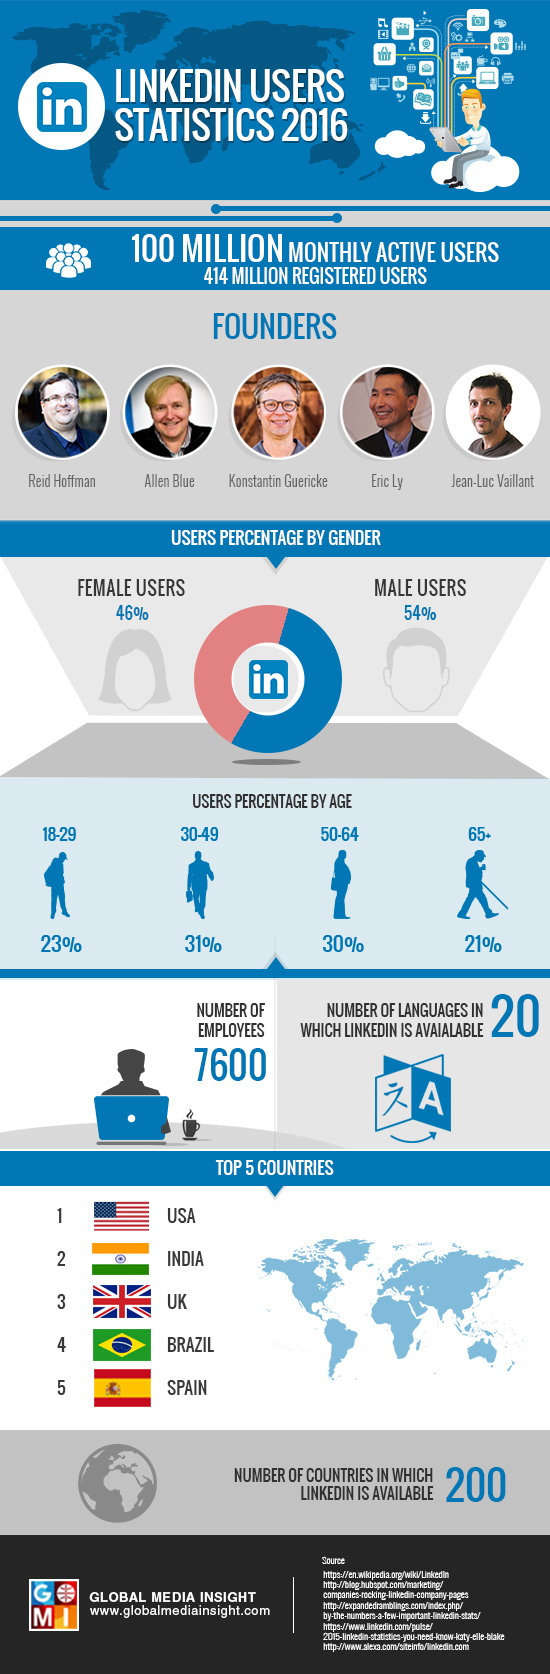 linkedIn-users-statistics-2016